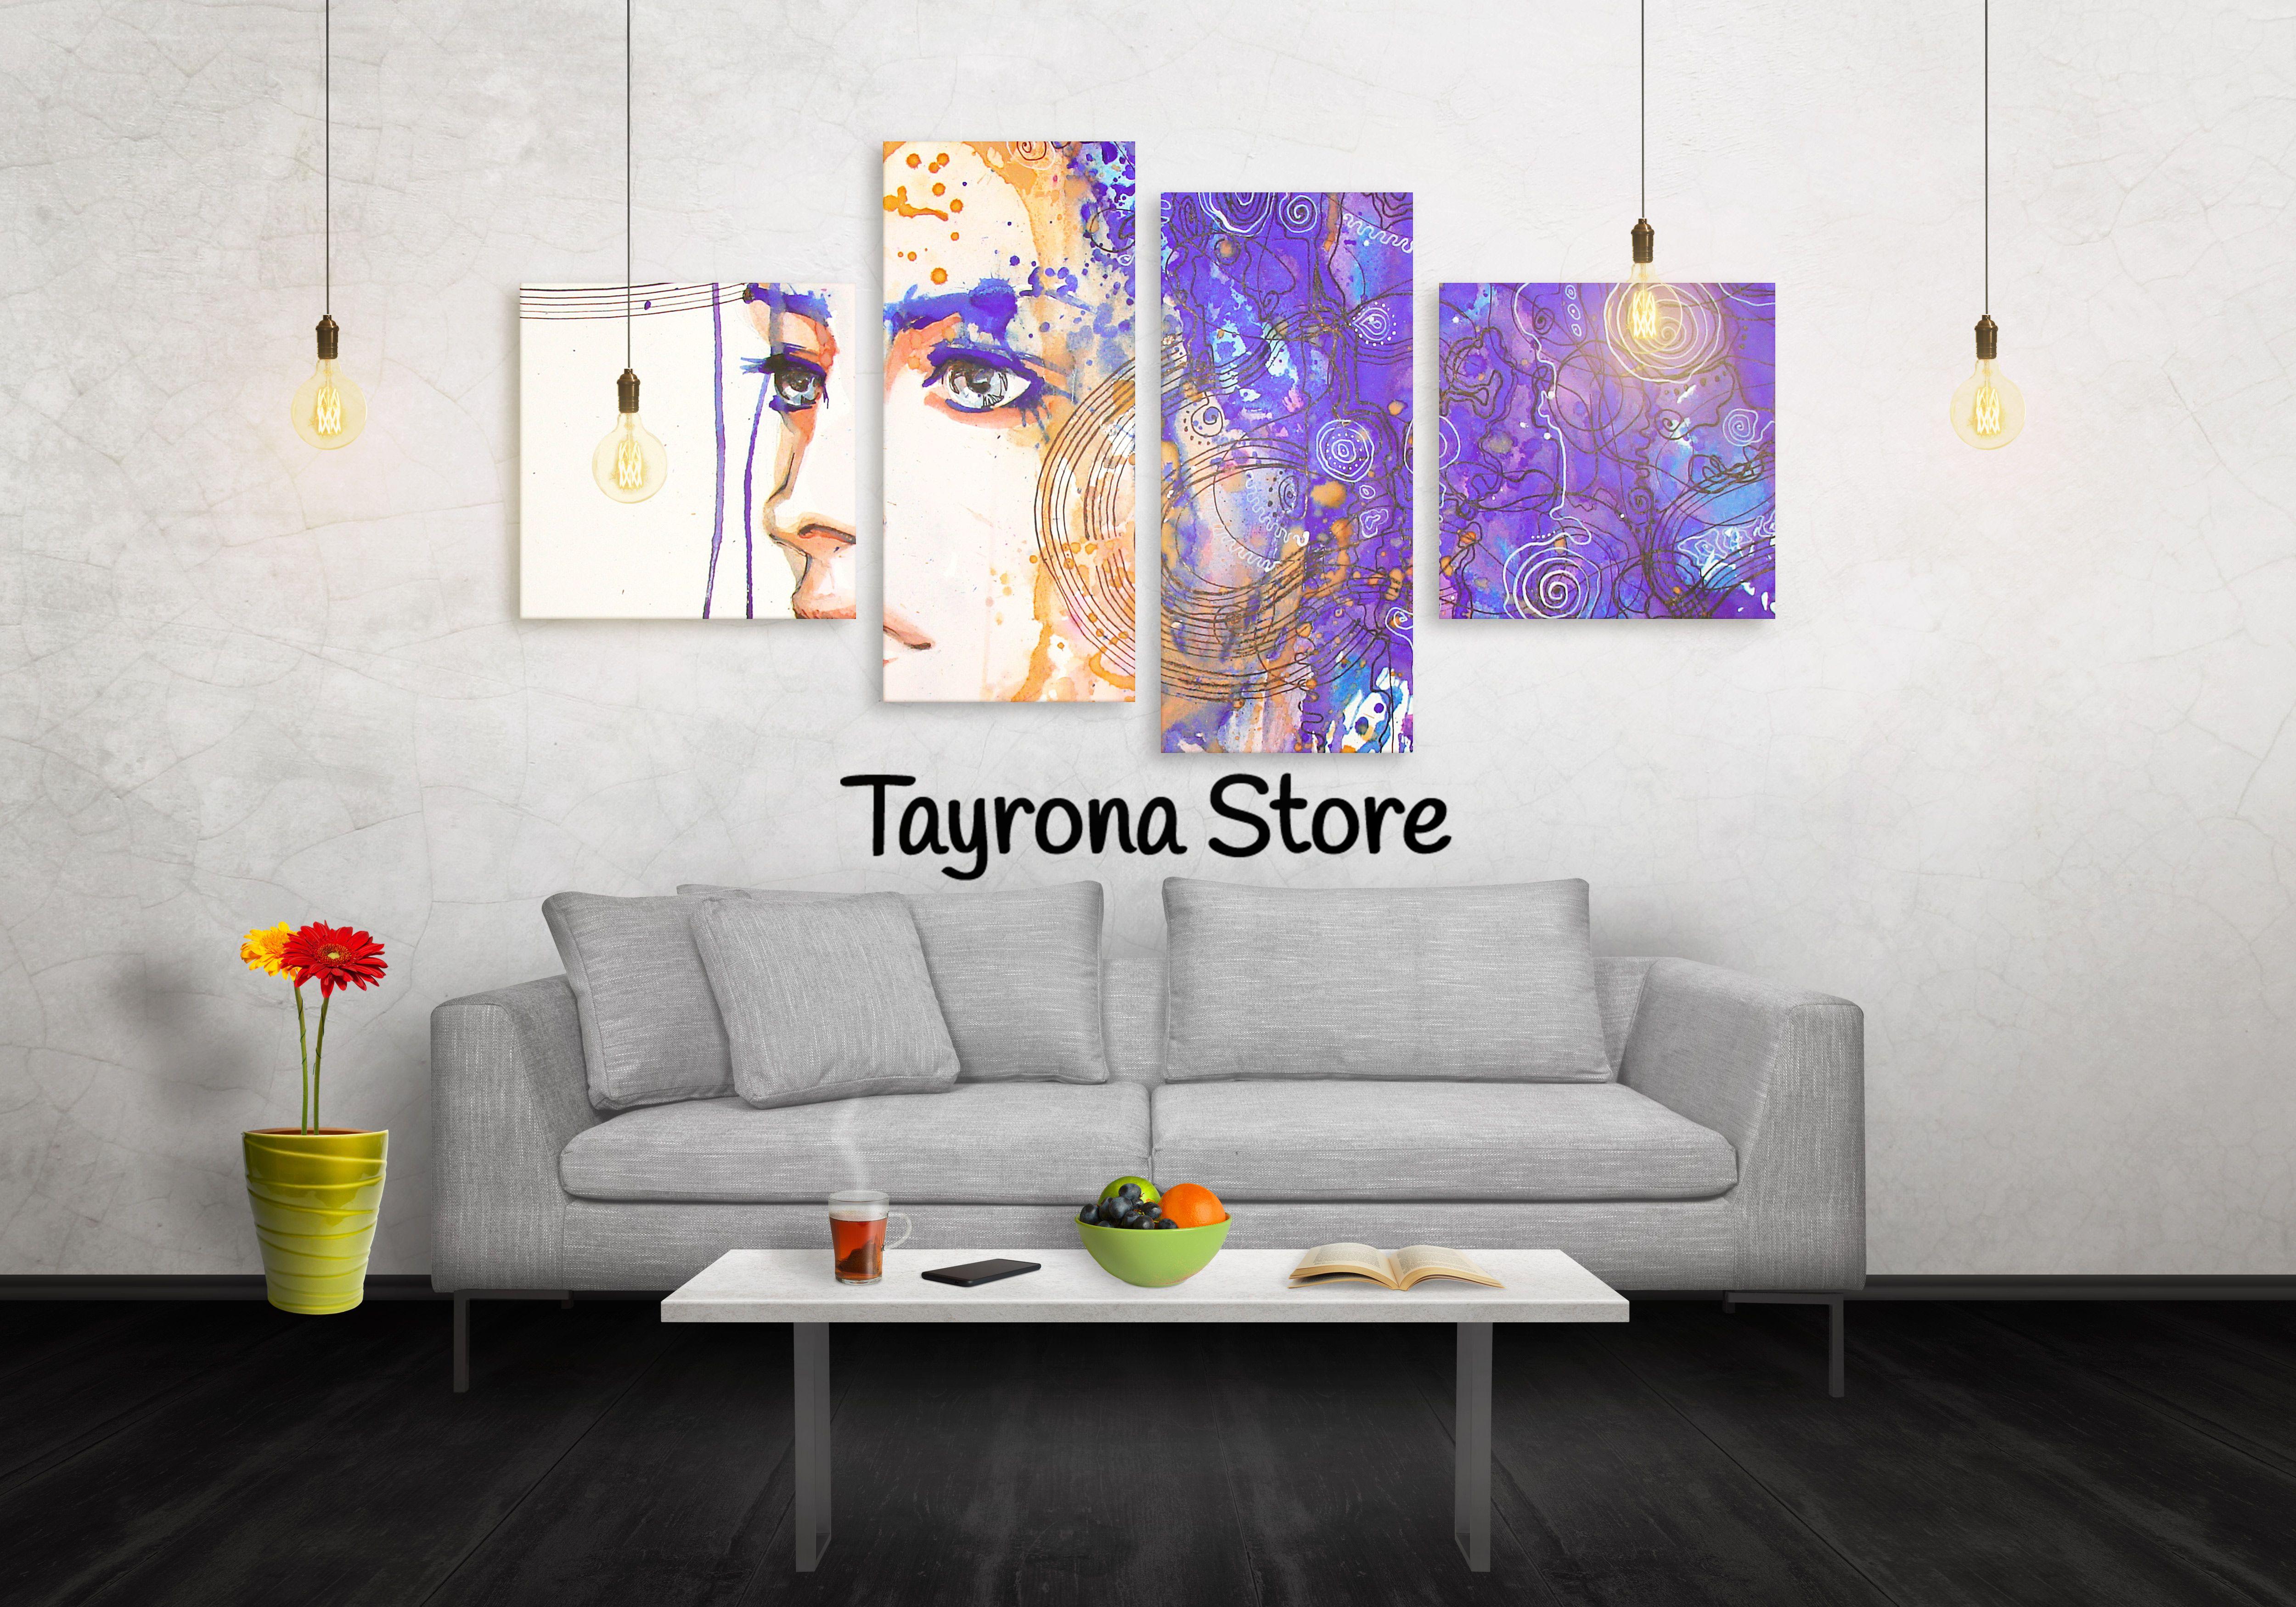 Cuadros Decorativos cara-mujer-art-33 #tayronastore,#cuadros ...